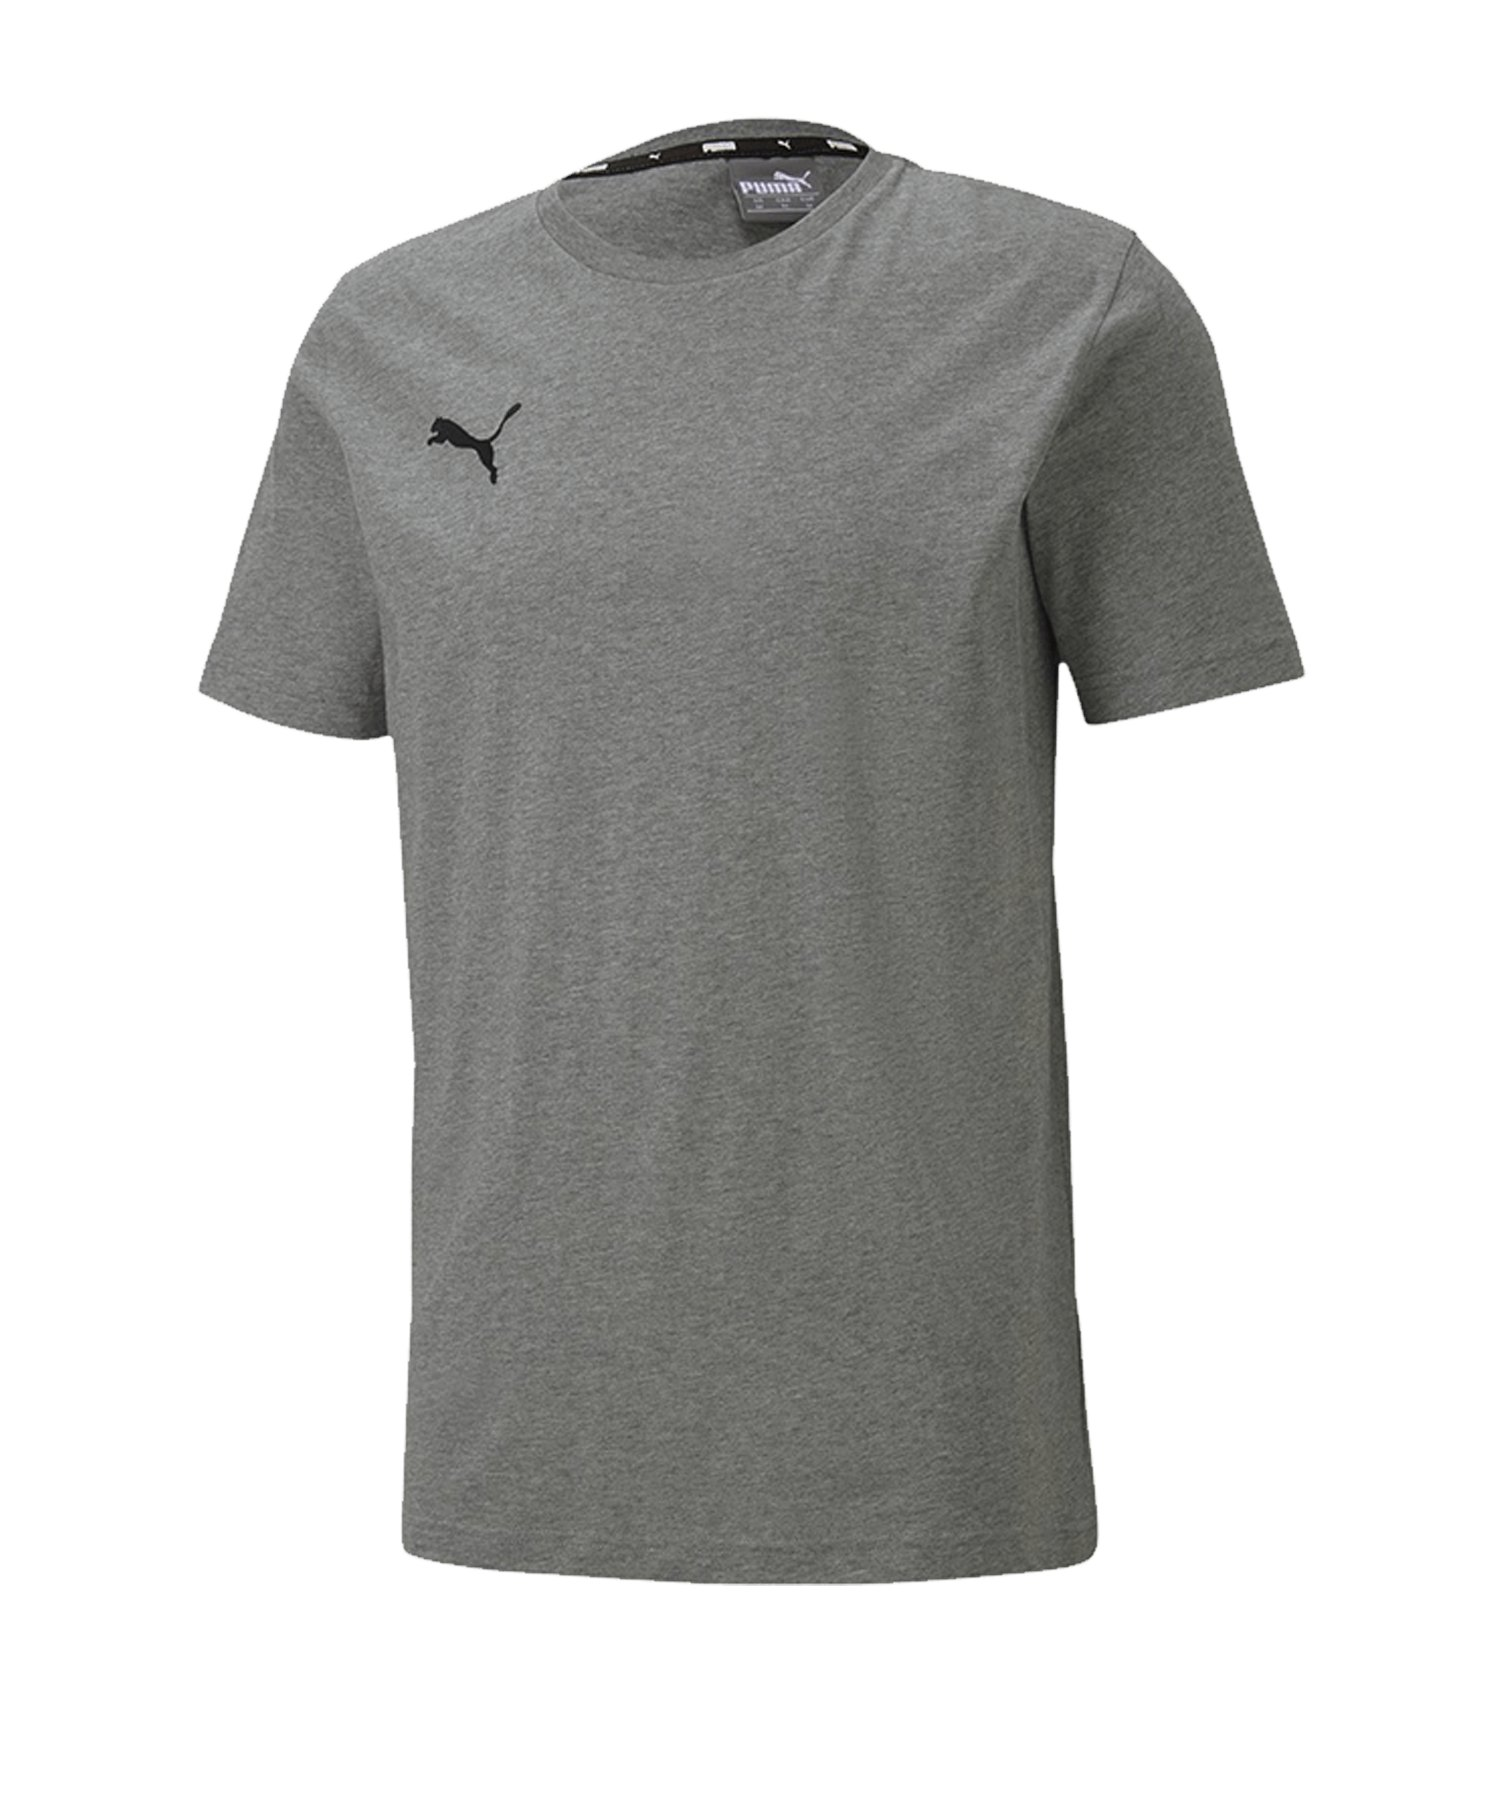 PUMA teamGOAL 23 Casuals Tee T-Shirt Grau F33 - grau